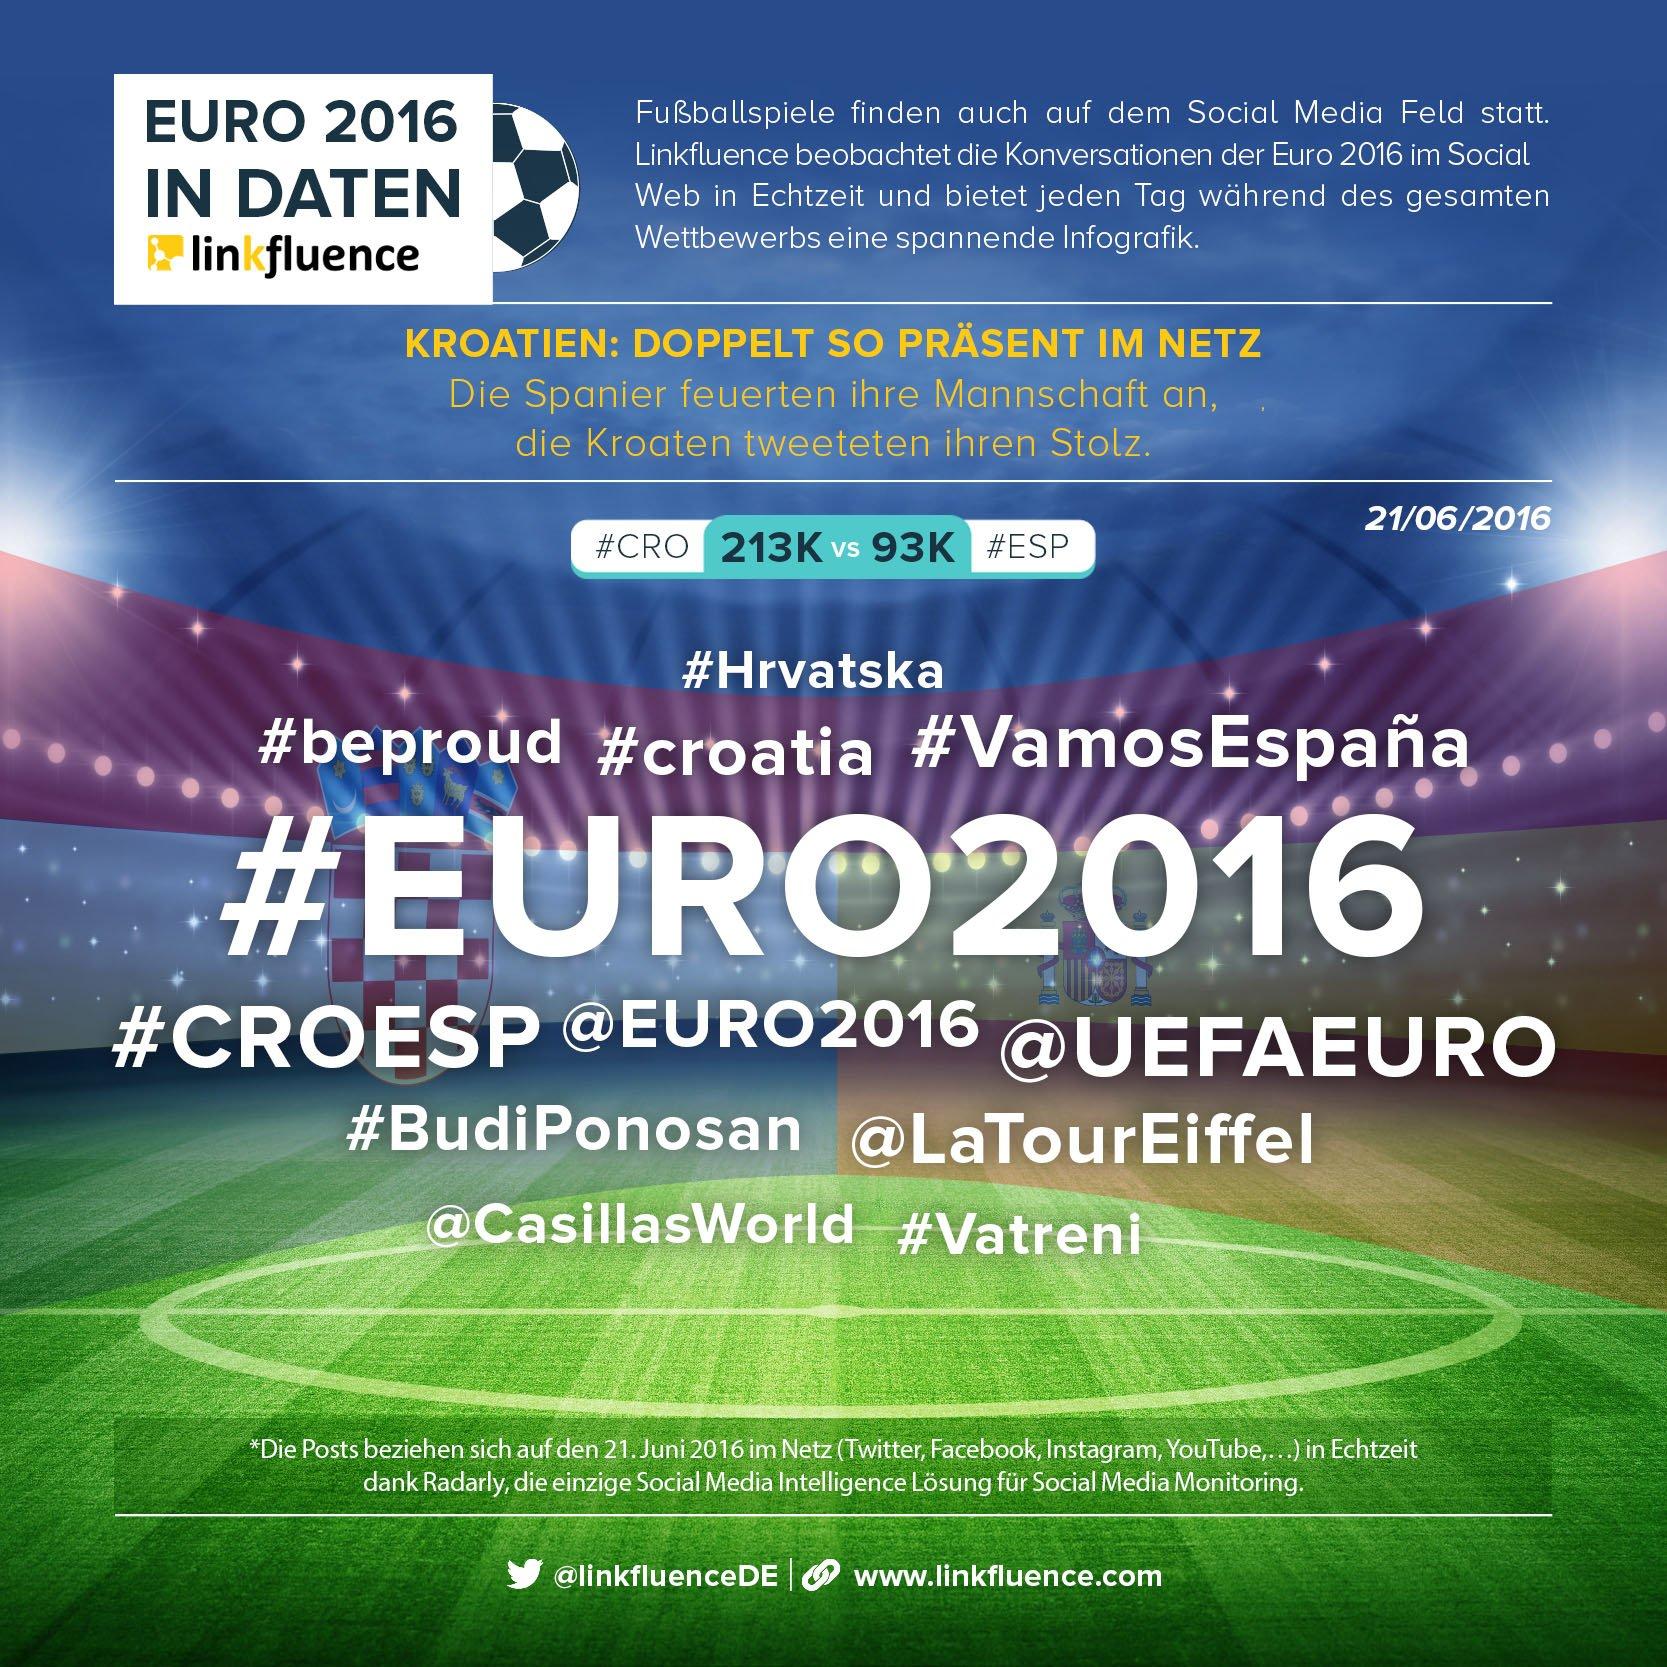 EURO2016_CapsuleDigitale_Dimanche19-06